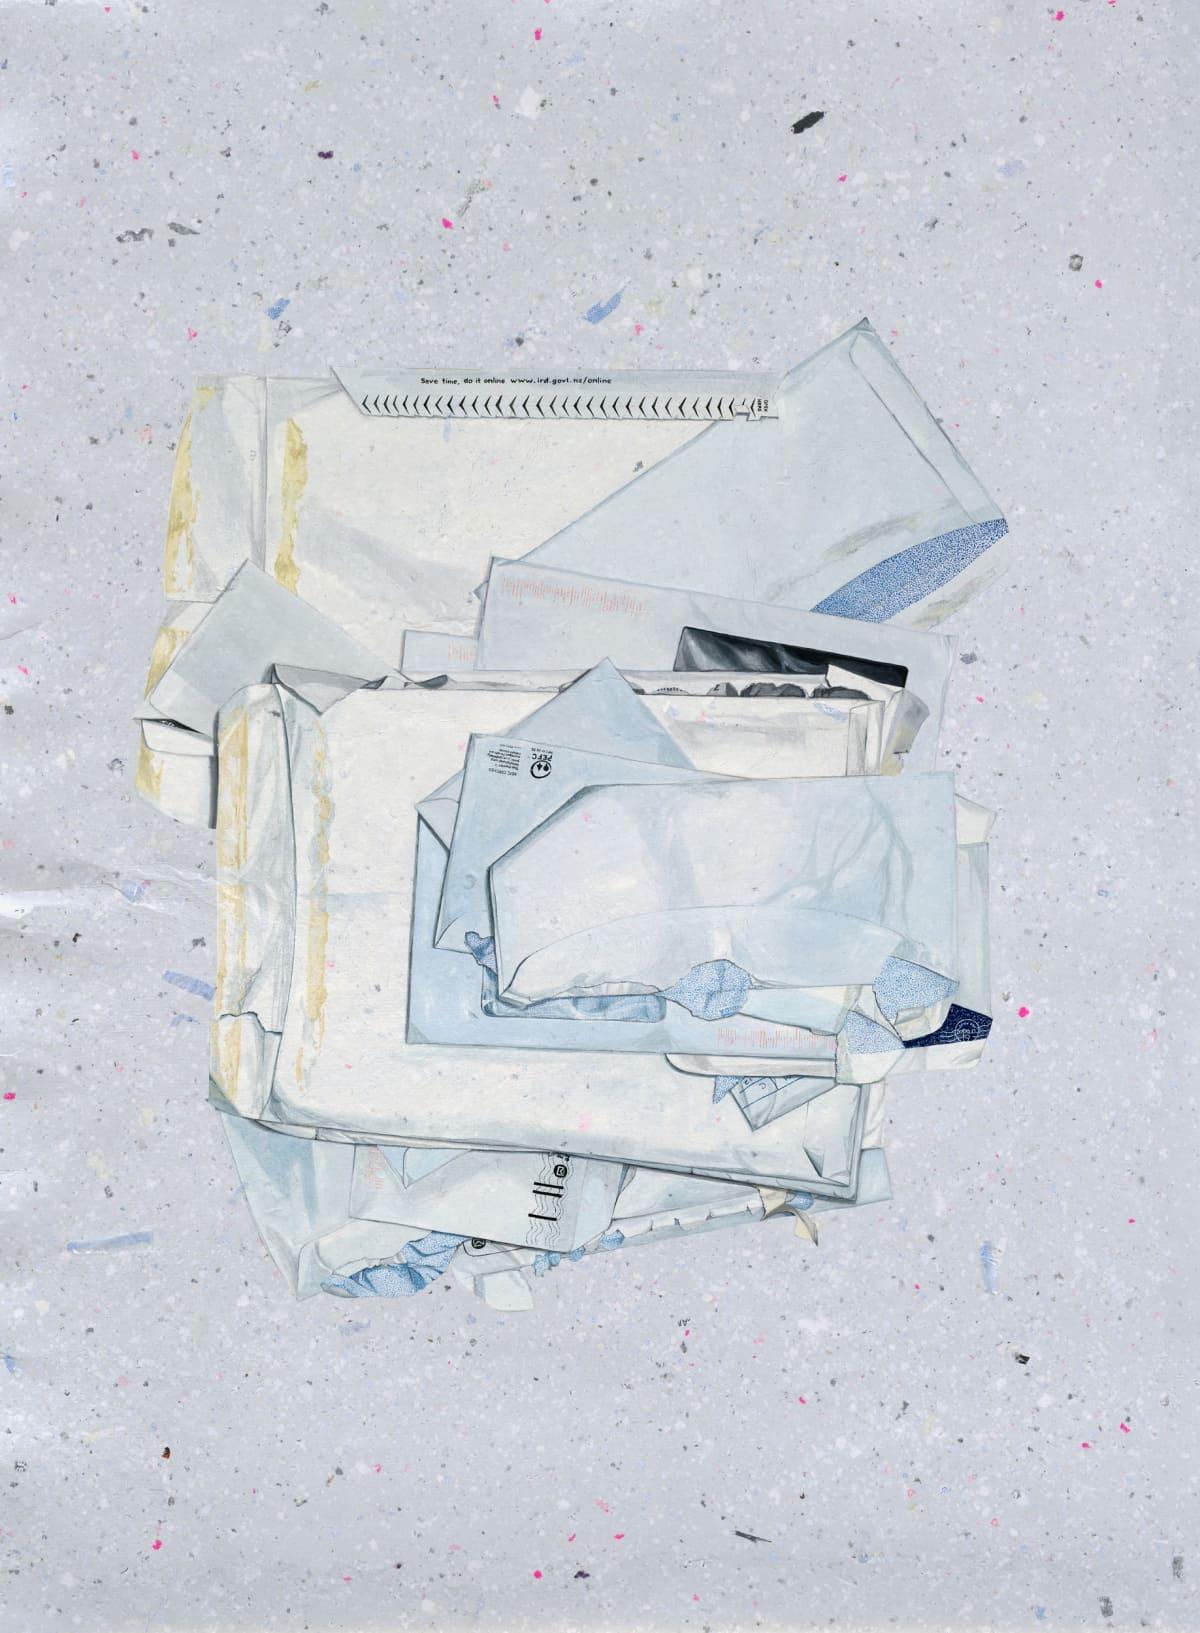 Marita Hewitt, Of Itself (Envelopes), 2016